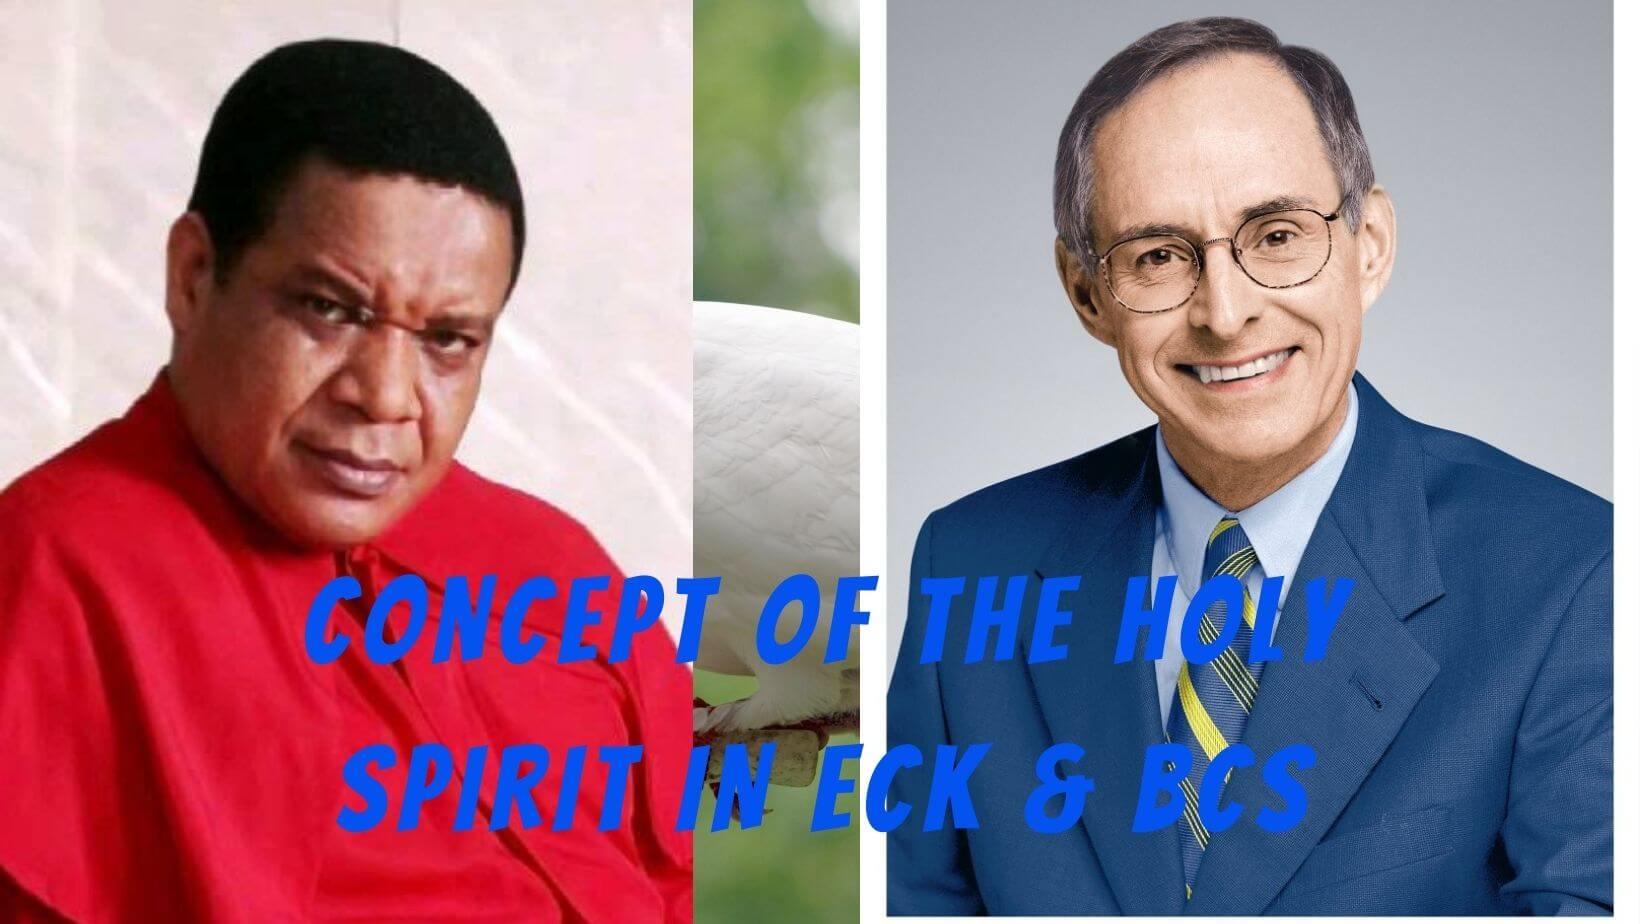 Holy spirit in Eckankar and brotherhood of cross and star